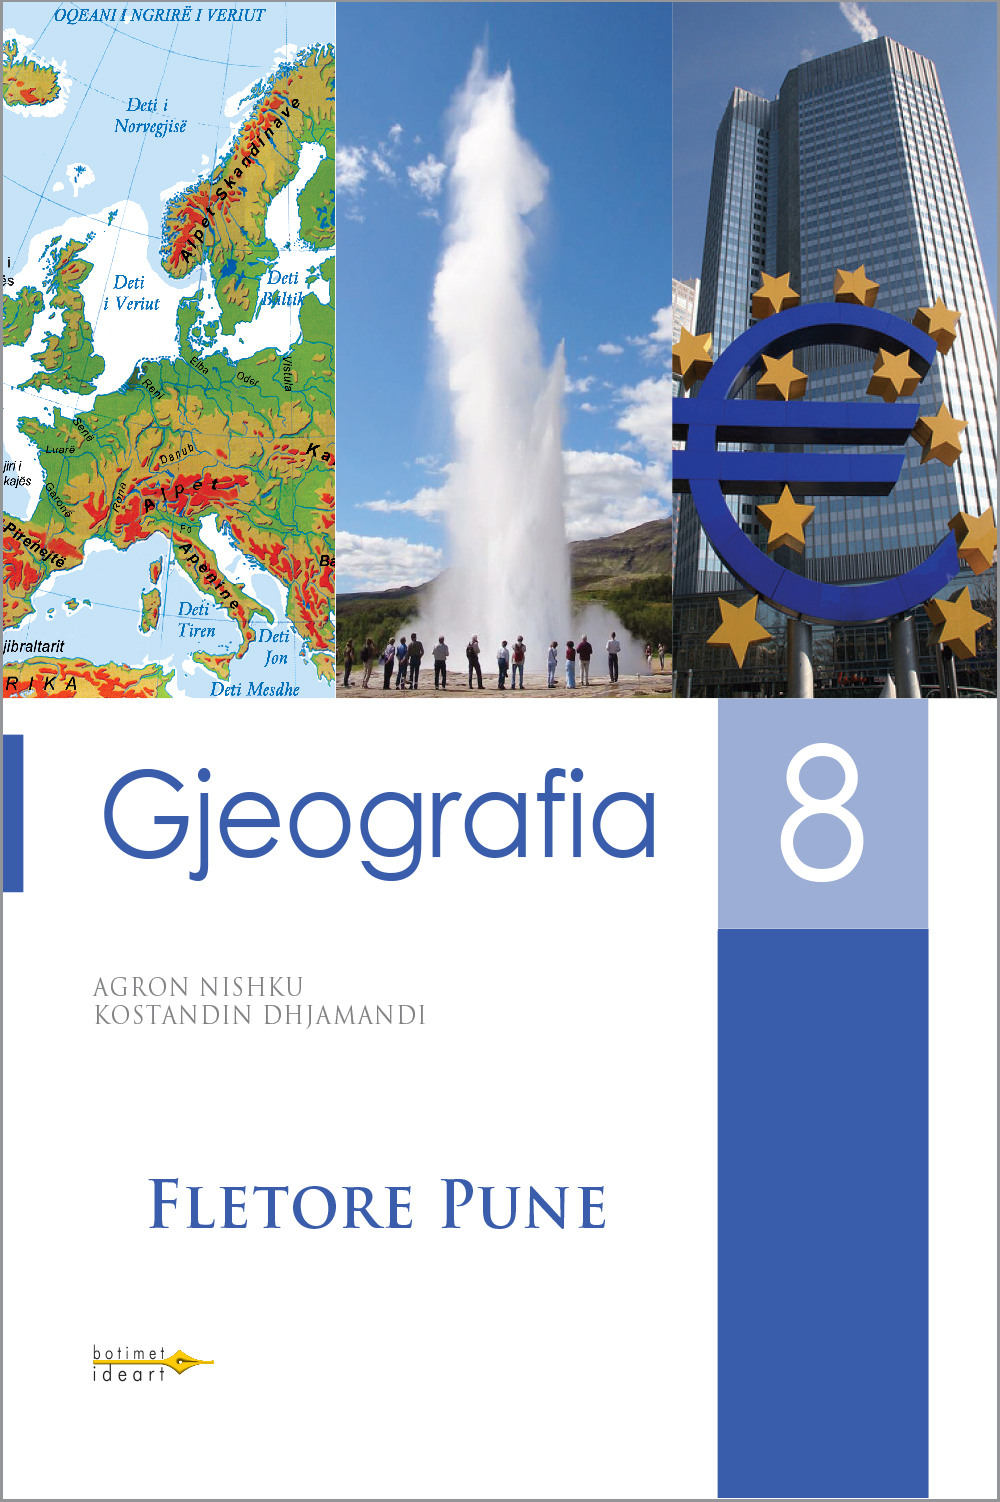 Fletore Pune<br>Gjeografia 8